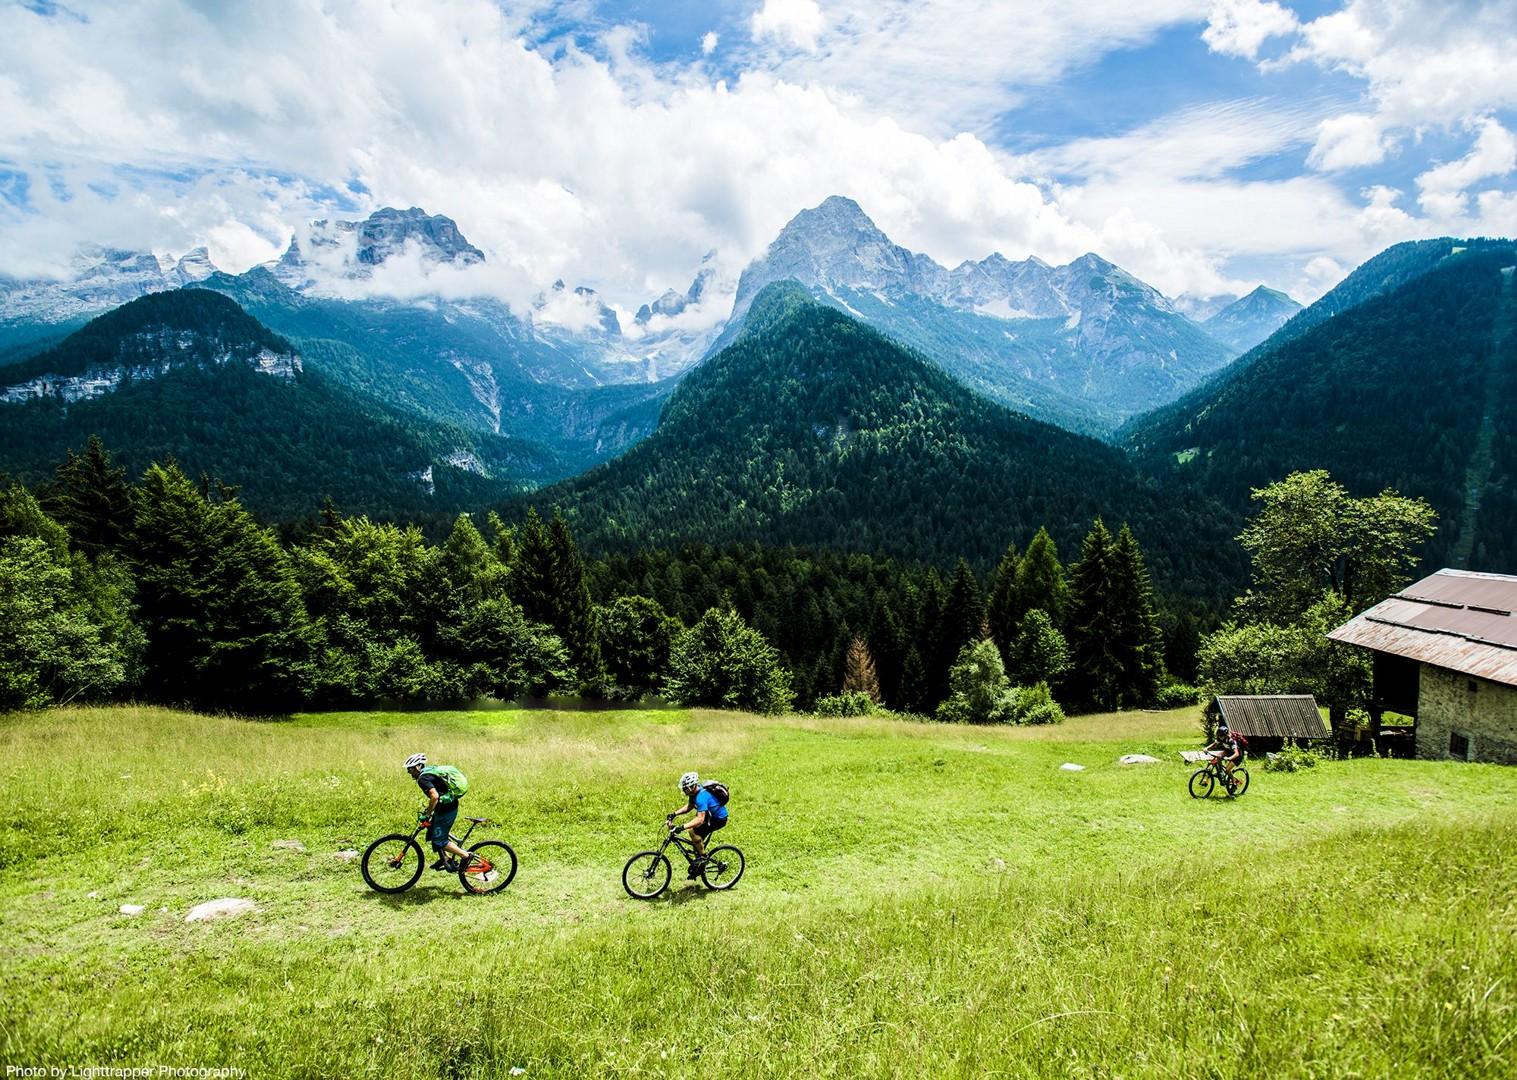 saddle_skedaddle_italy_2017_day6_brenta_dolomites_143-2.jpg - Italy - Dolomites of Brenta - Guided Mountain Bike Holiday - Mountain Biking